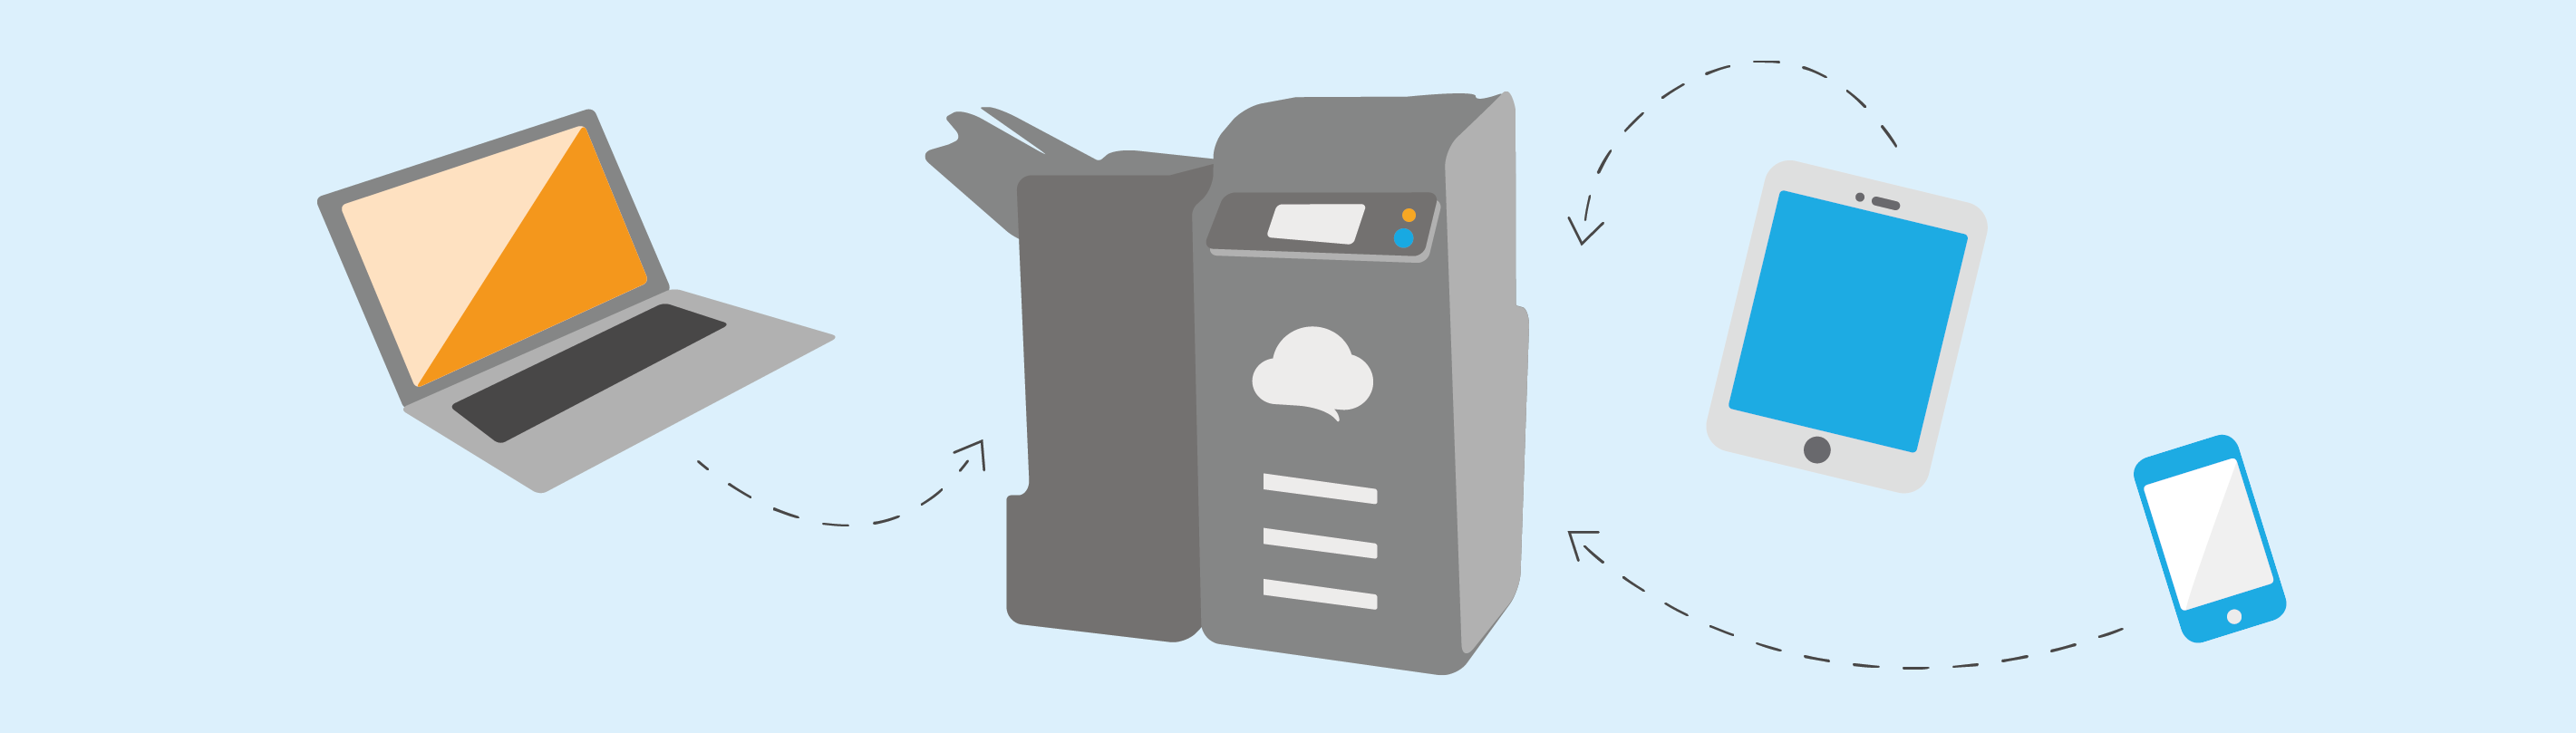 Header afbeelding - cloudprinten